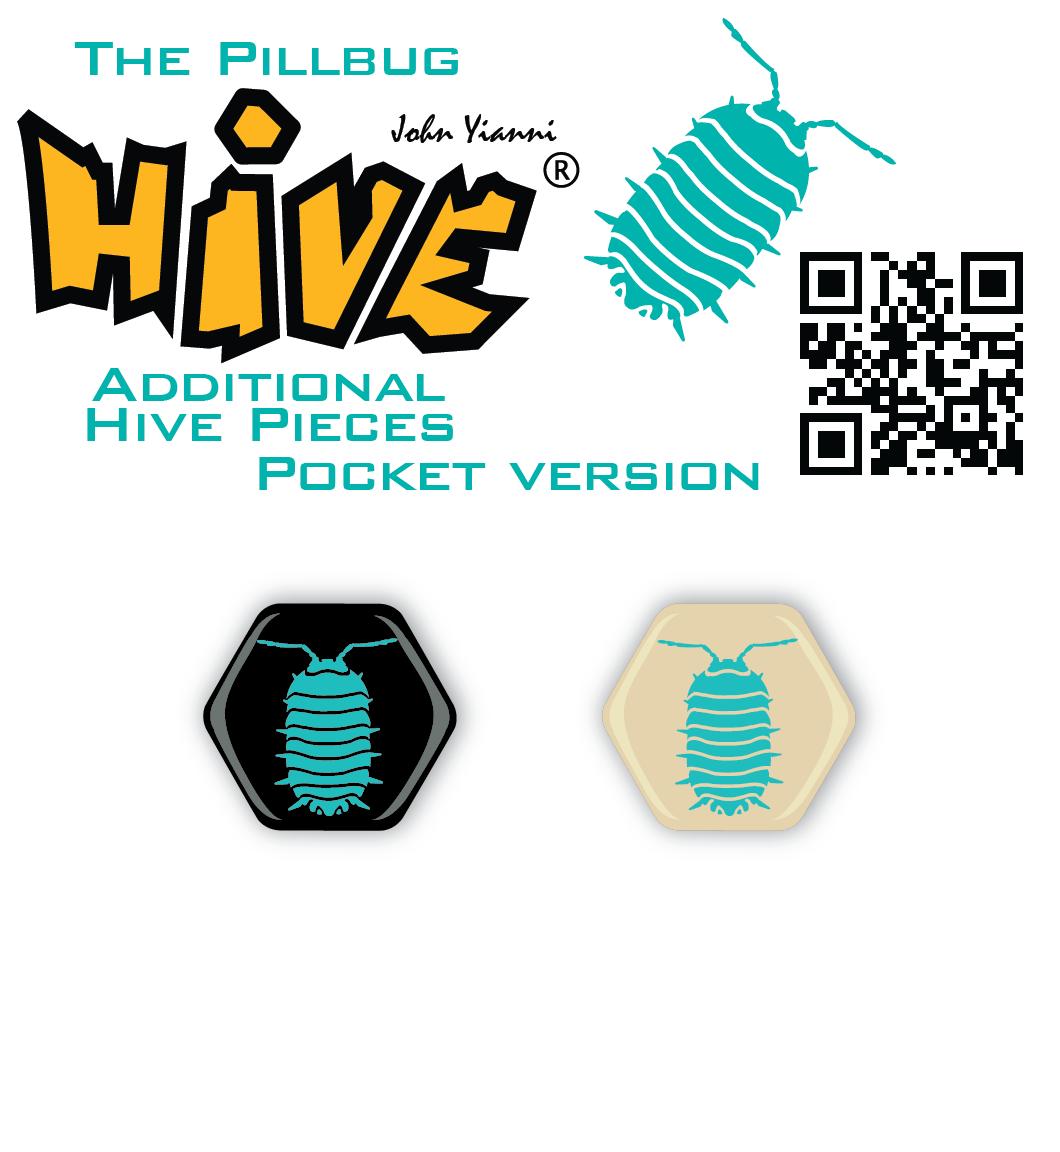 Hive Pocket - Pillbug - Onisco